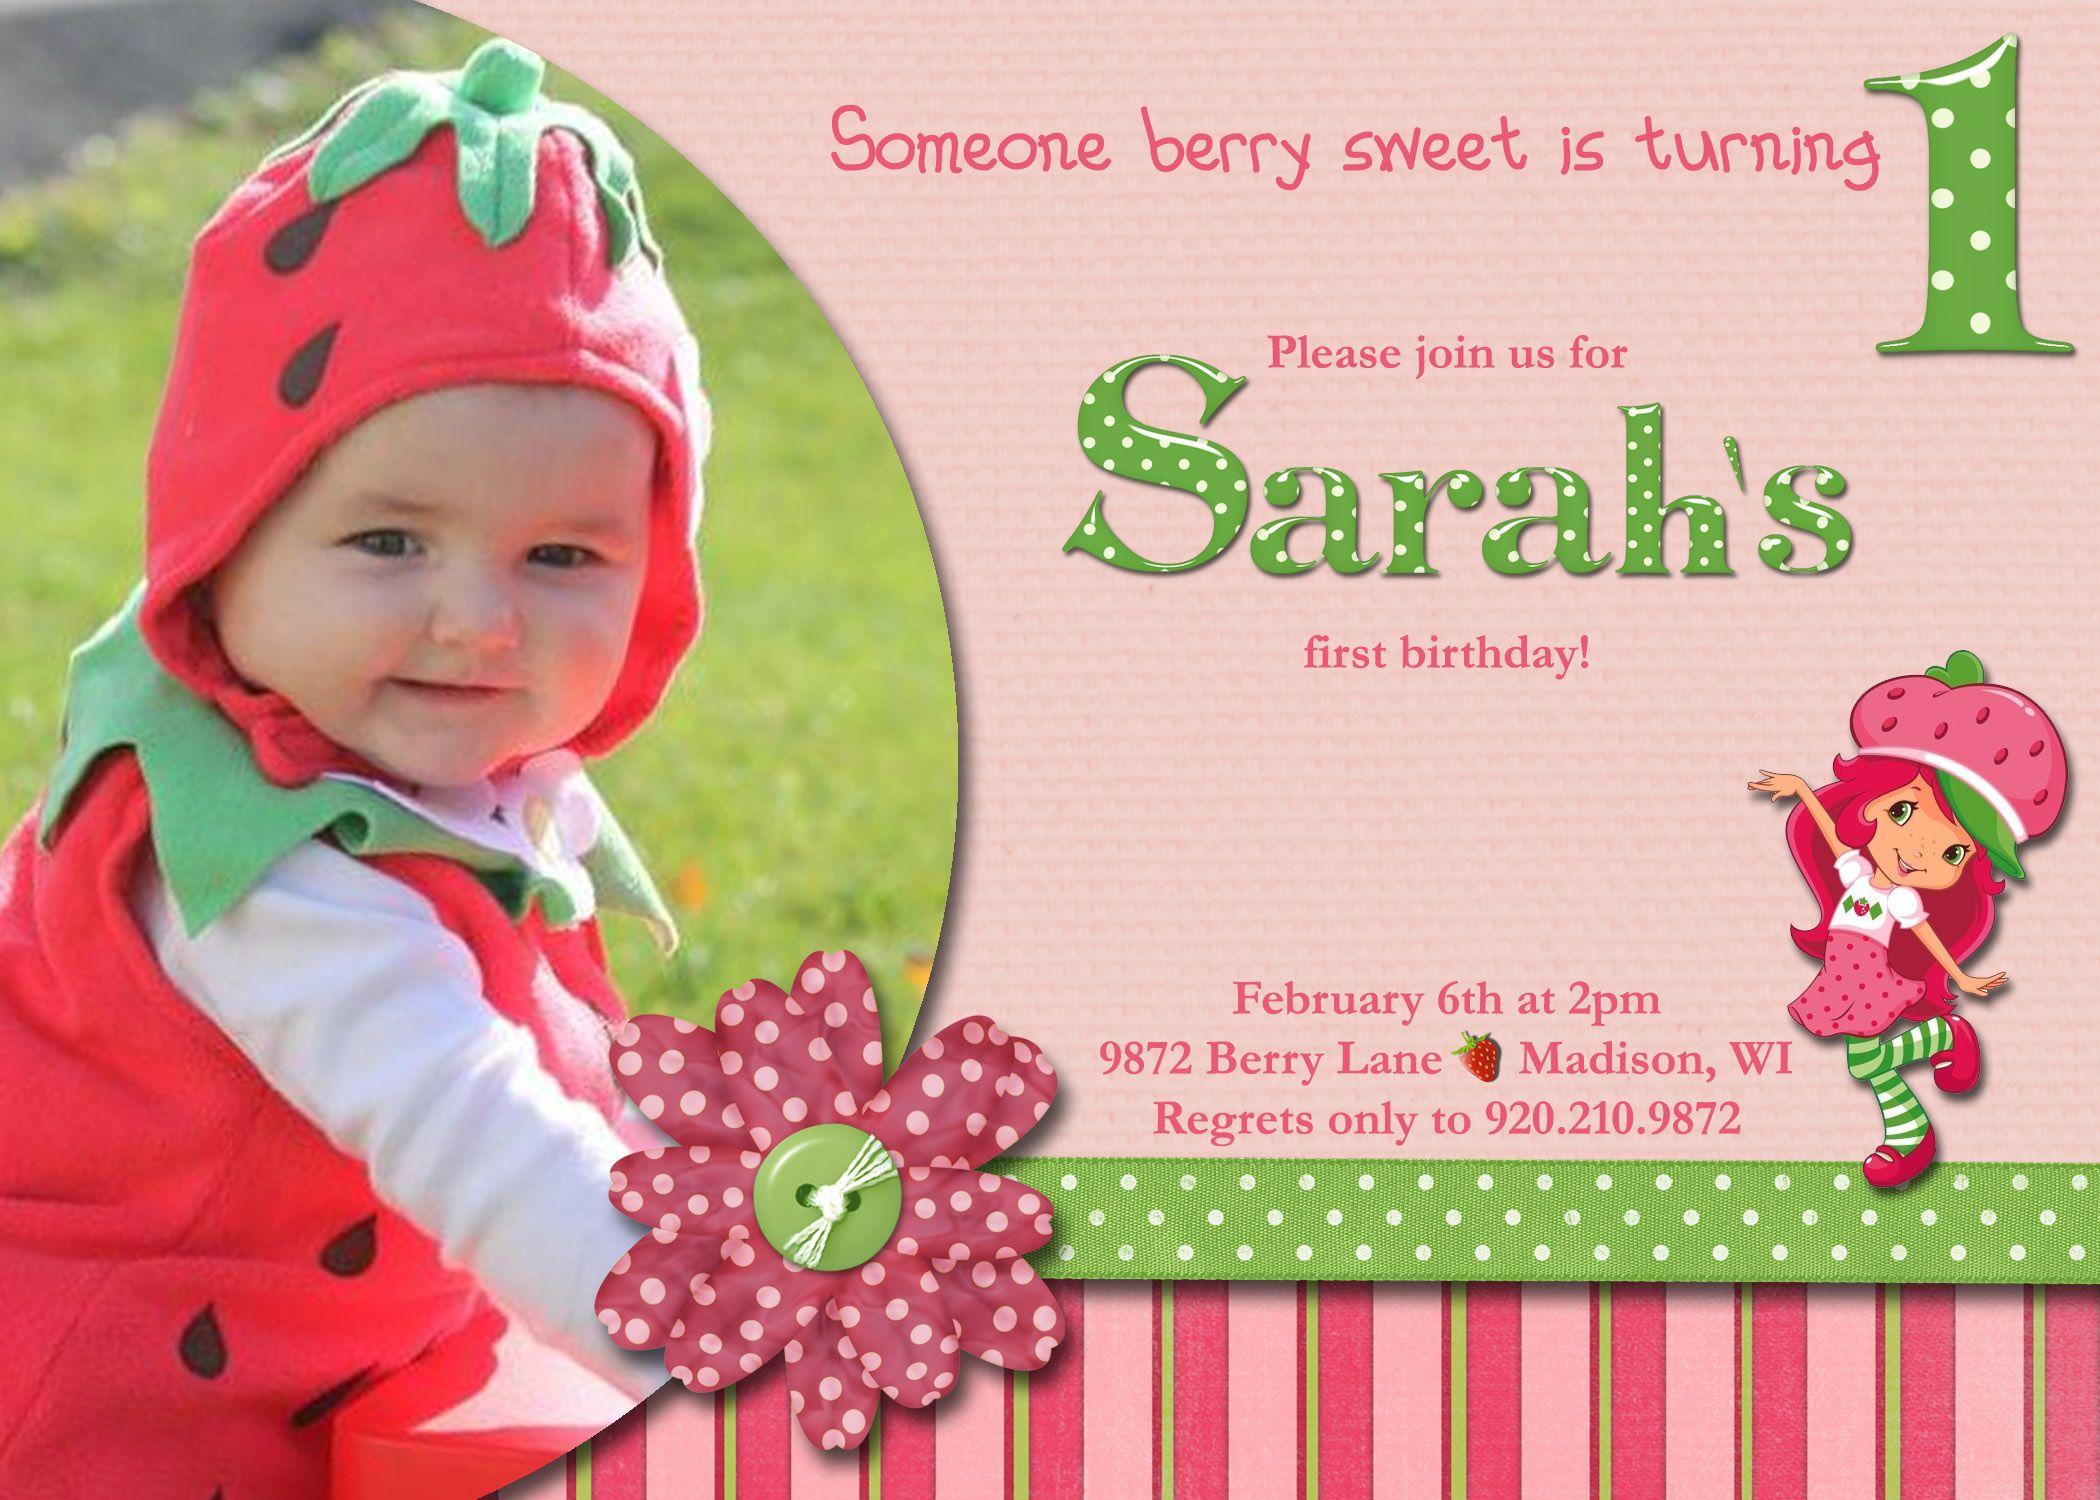 Someone Berry Sweet Strawberry Shortcake Birthday Invitation 5x7